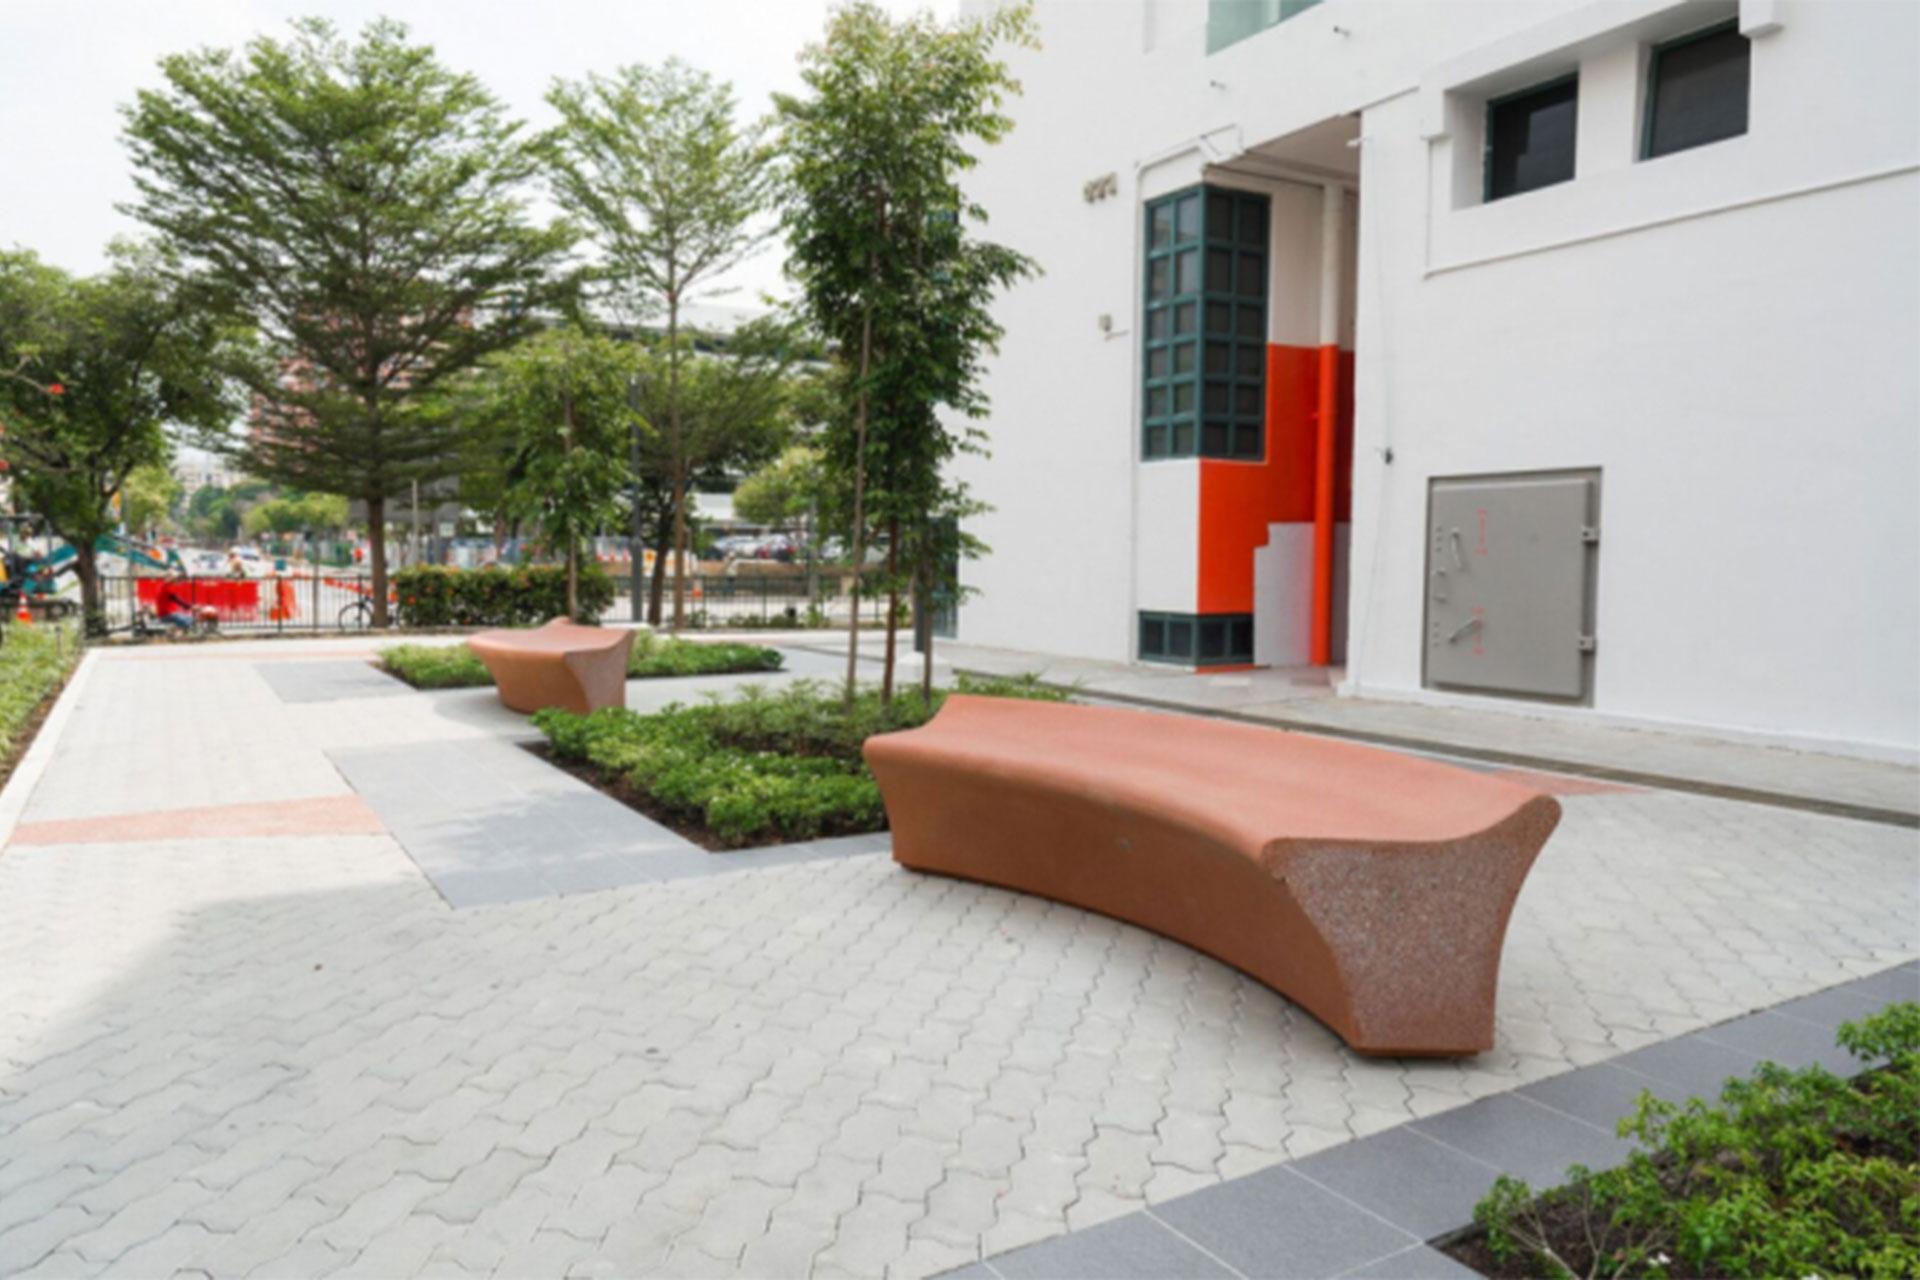 UrbanObjekts Ona Sitzgelegenheit